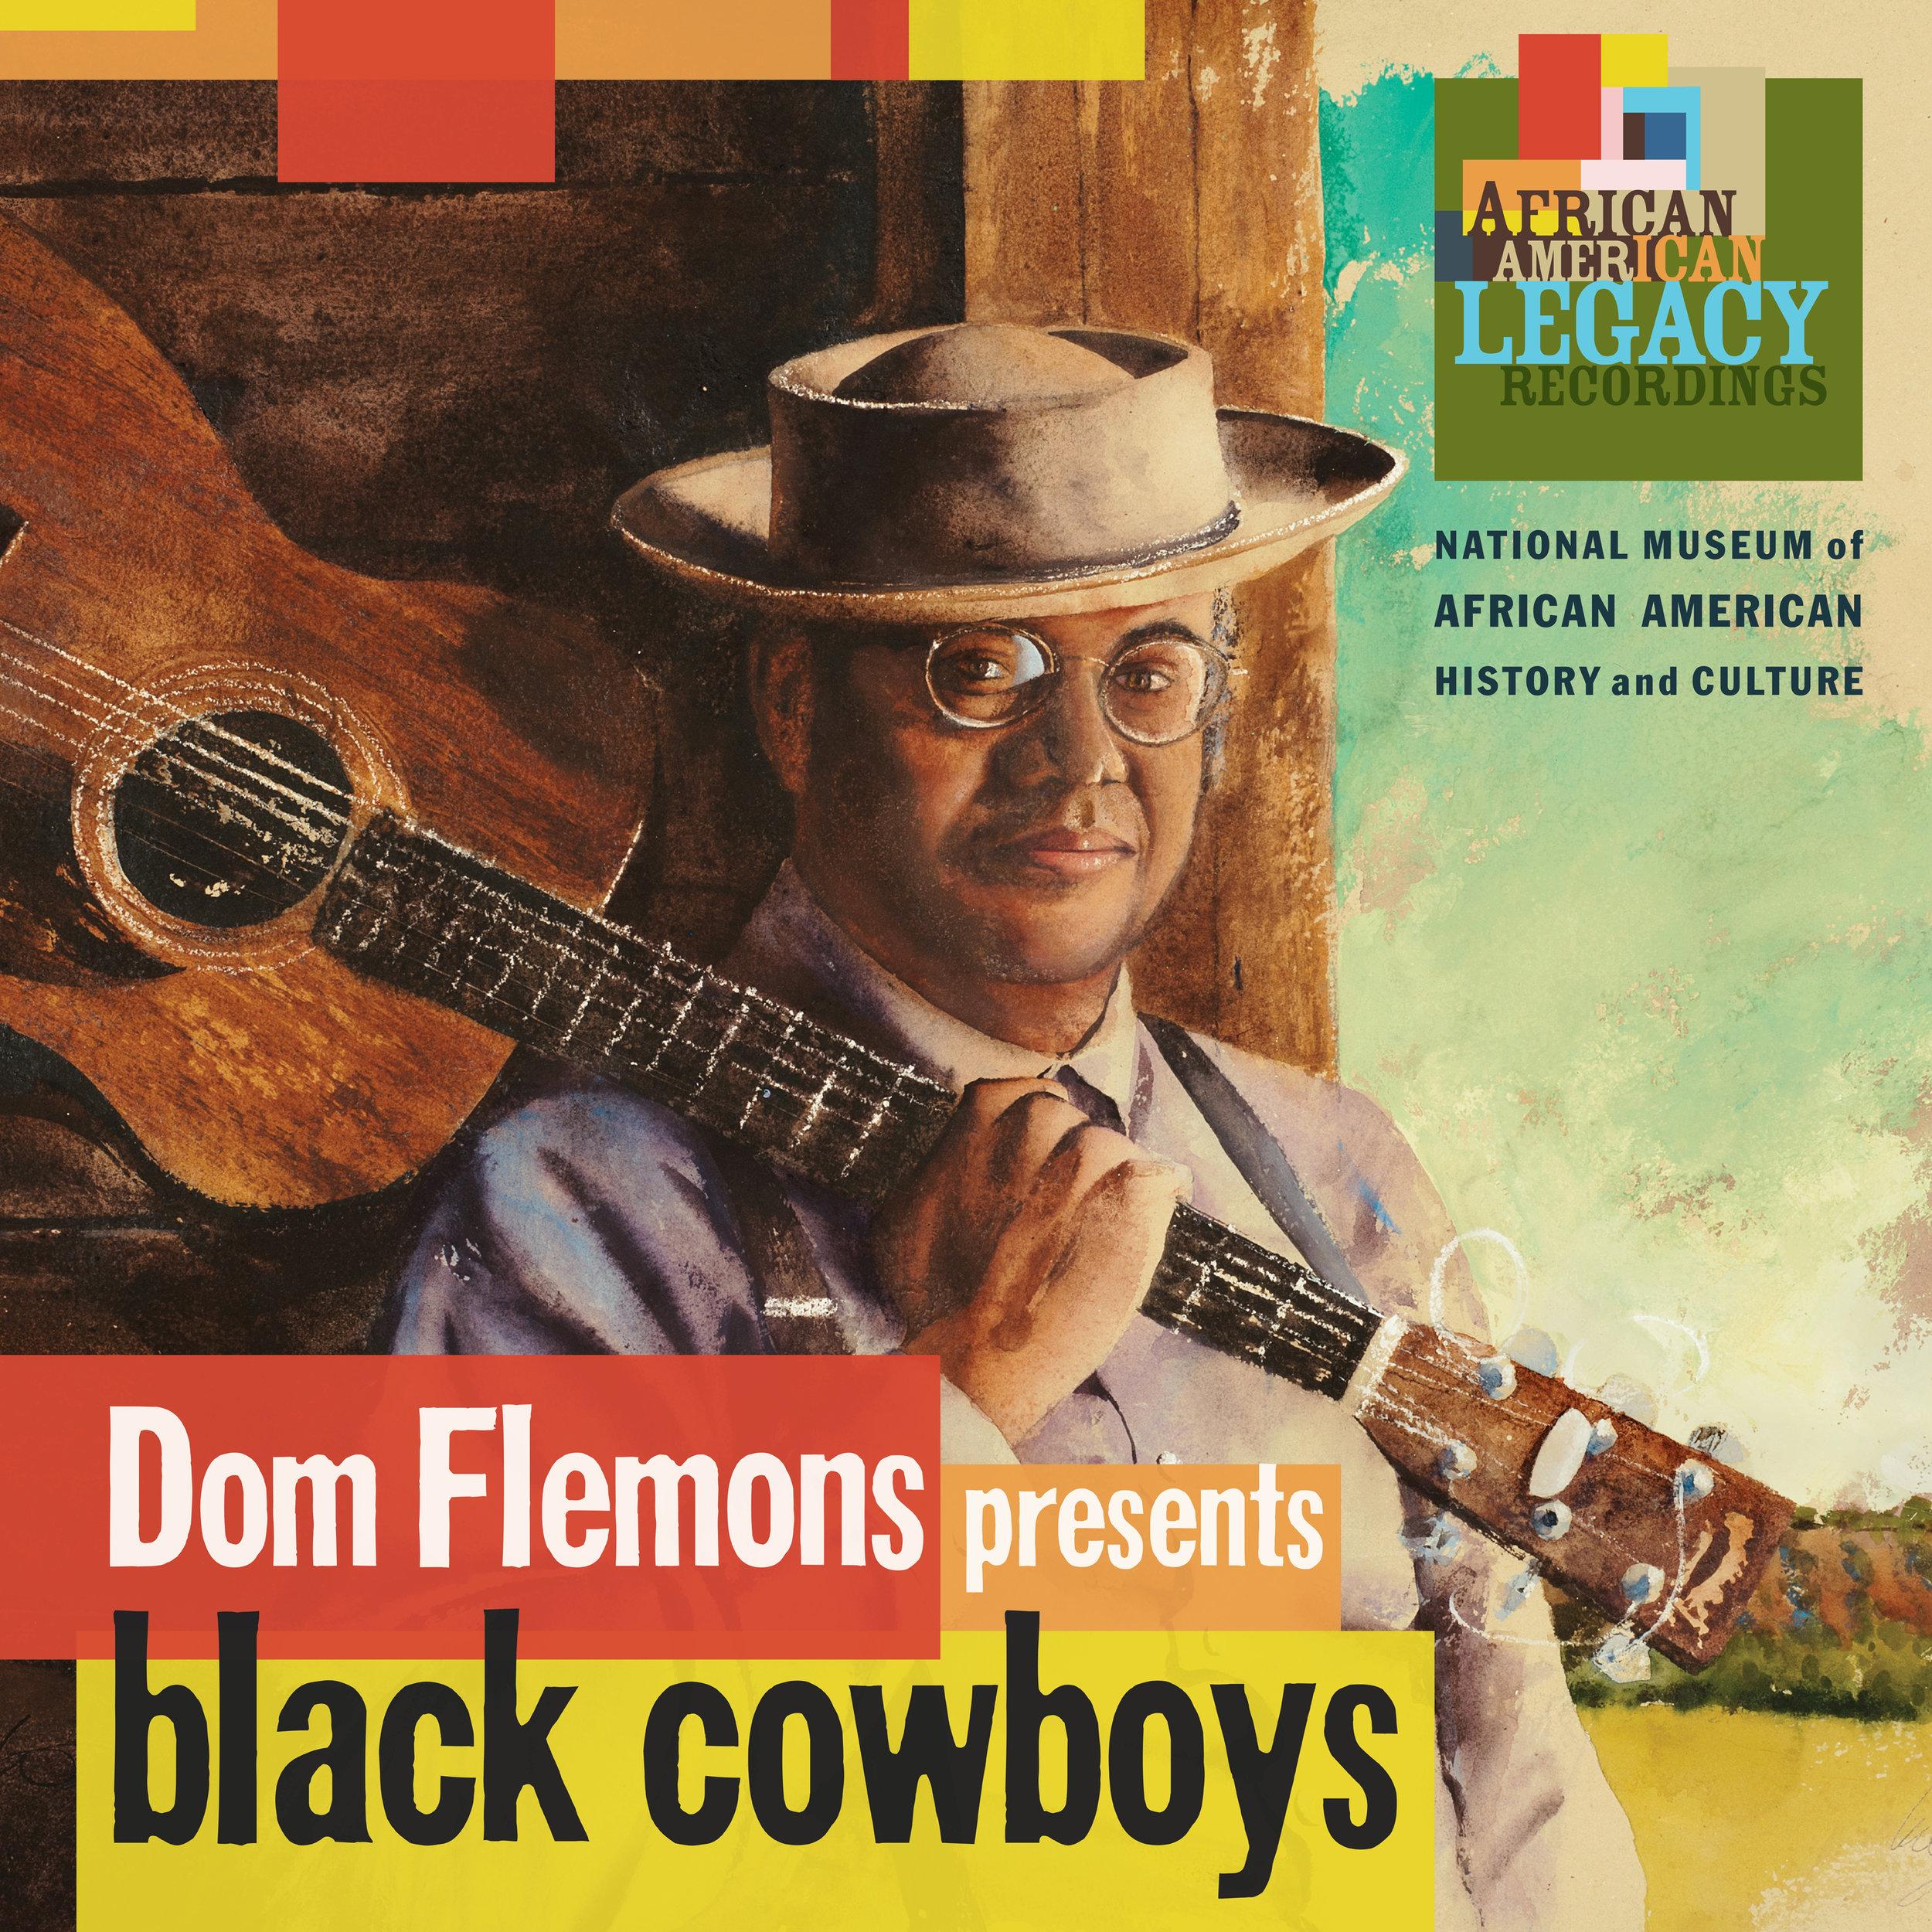 Black Cowboys -2018 Grammy® NomineeBlues Music Awards nominee (Best Acoustic Blues Album) - Dom Flemonsmarch 23, 2018Smithsonian Folkways RecordingsProduced by Dom Flemons, Dan Sheehy